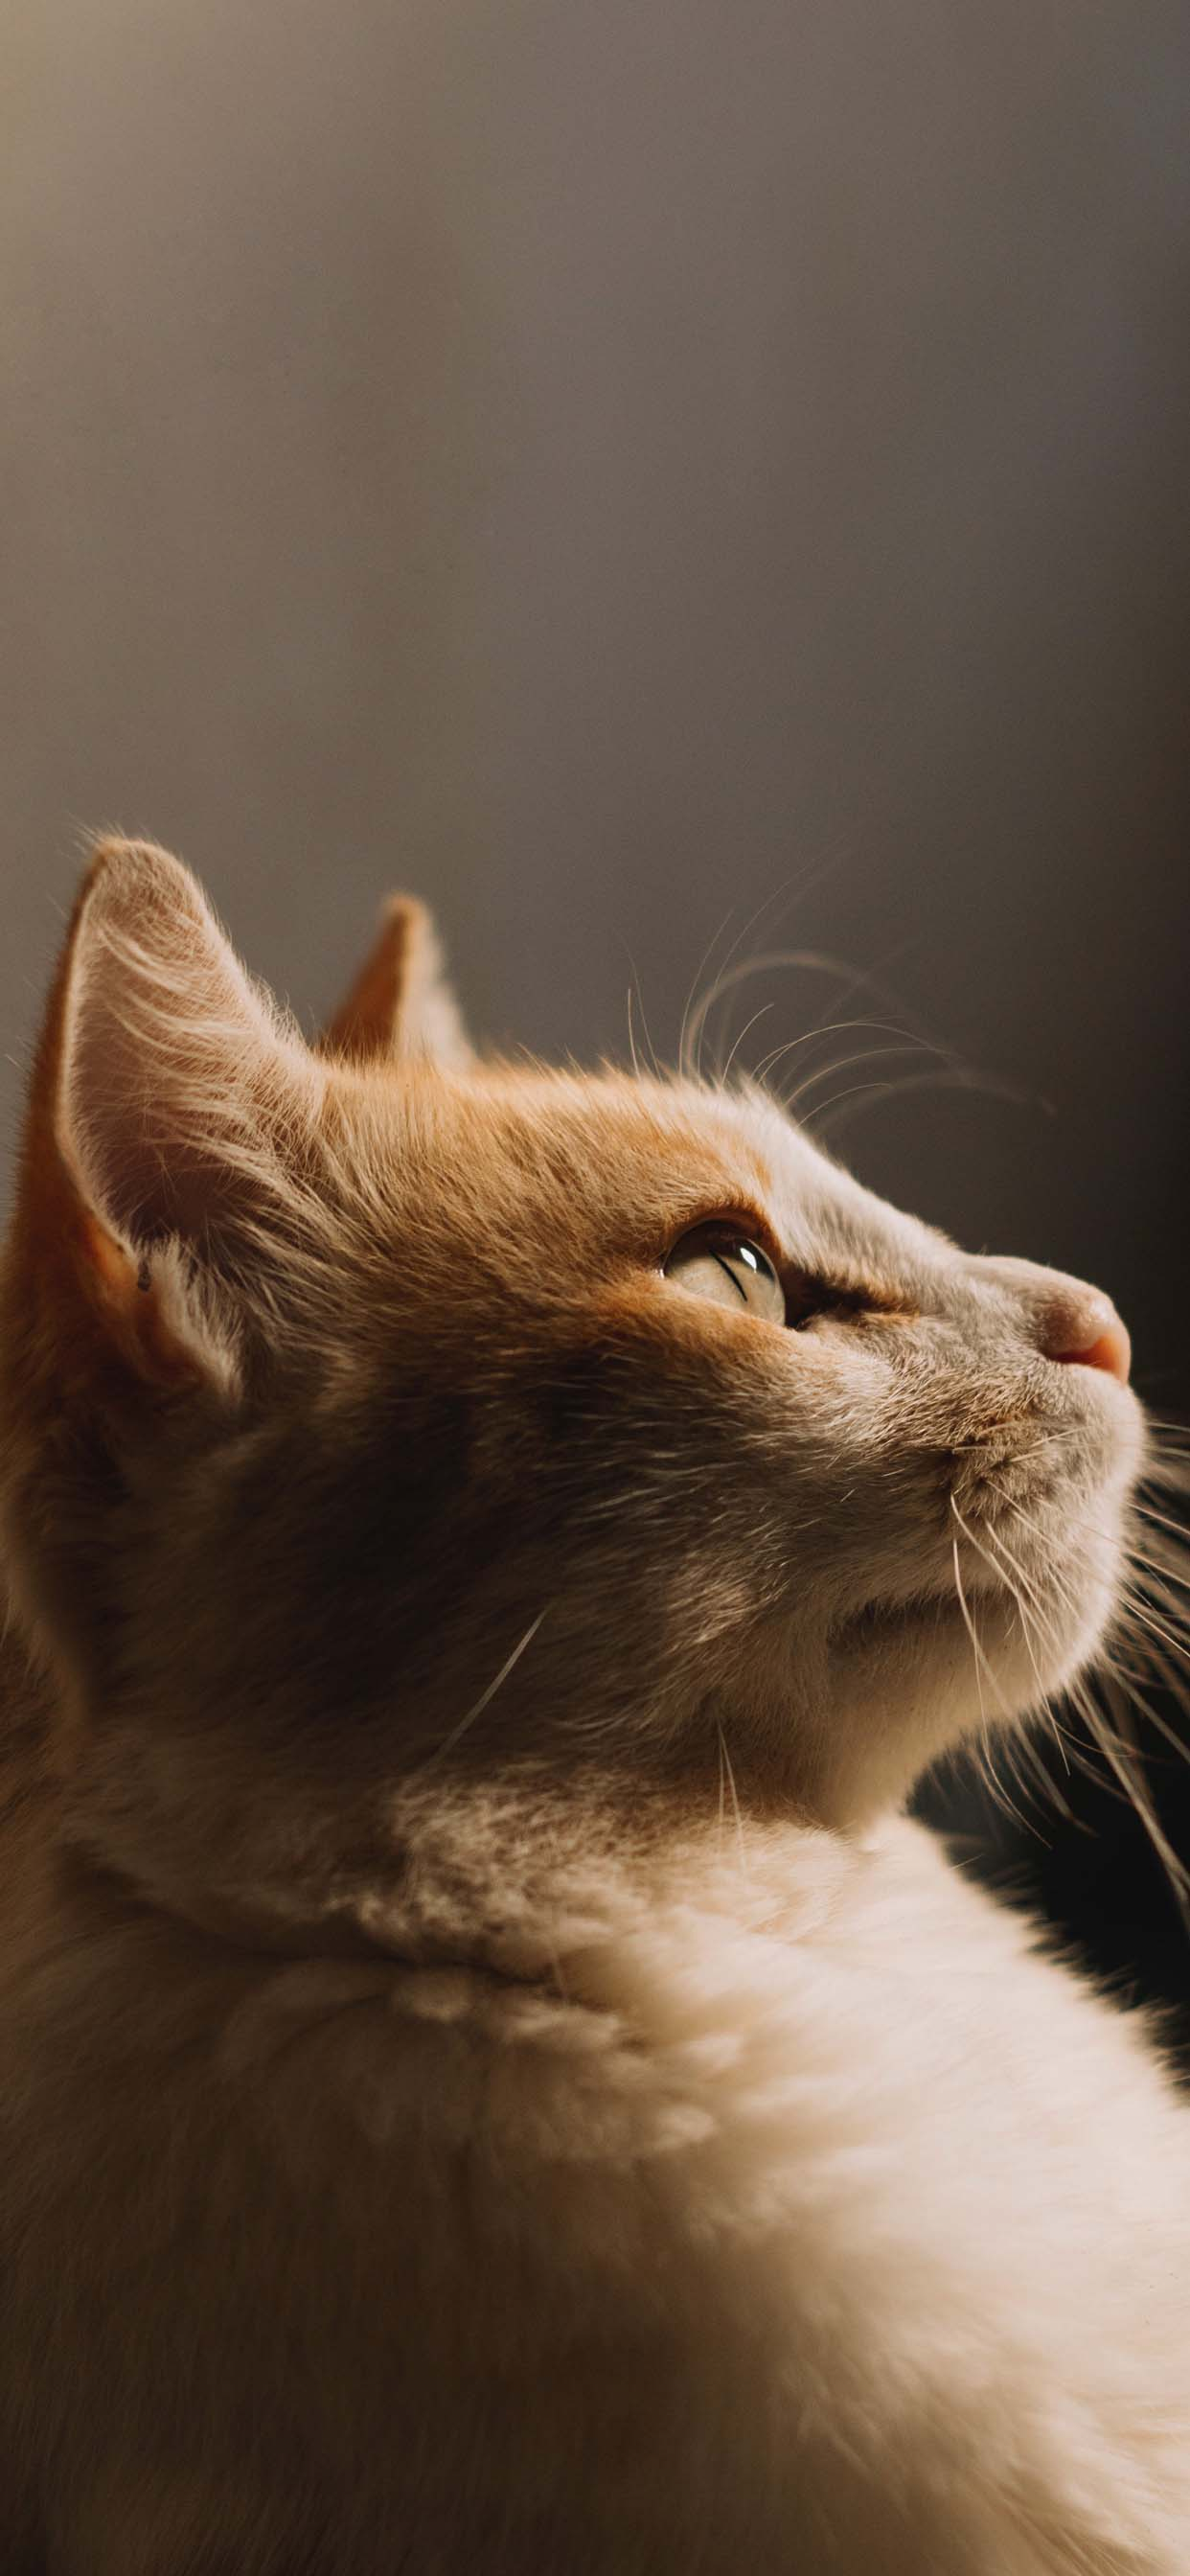 Beautiful Cat Face Portrait iPhone Wallpaper